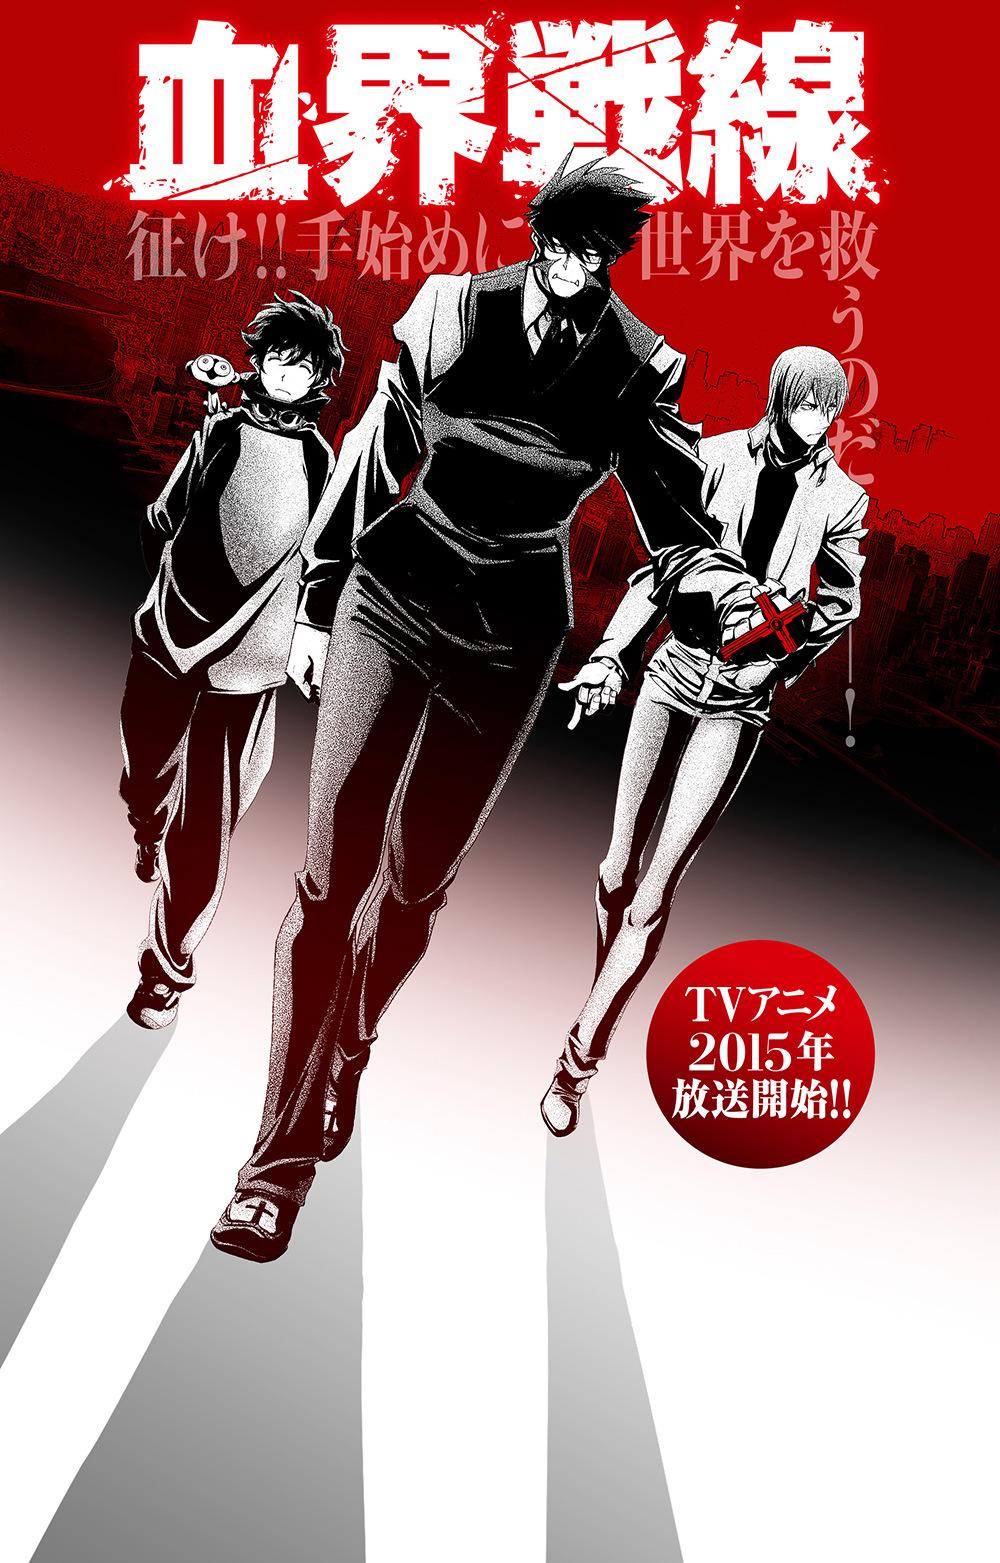 e7c6c6ccf0 - [Aporte] Kekkai Sensen  [12/12][80MB] - Anime Ligero [Descargas]